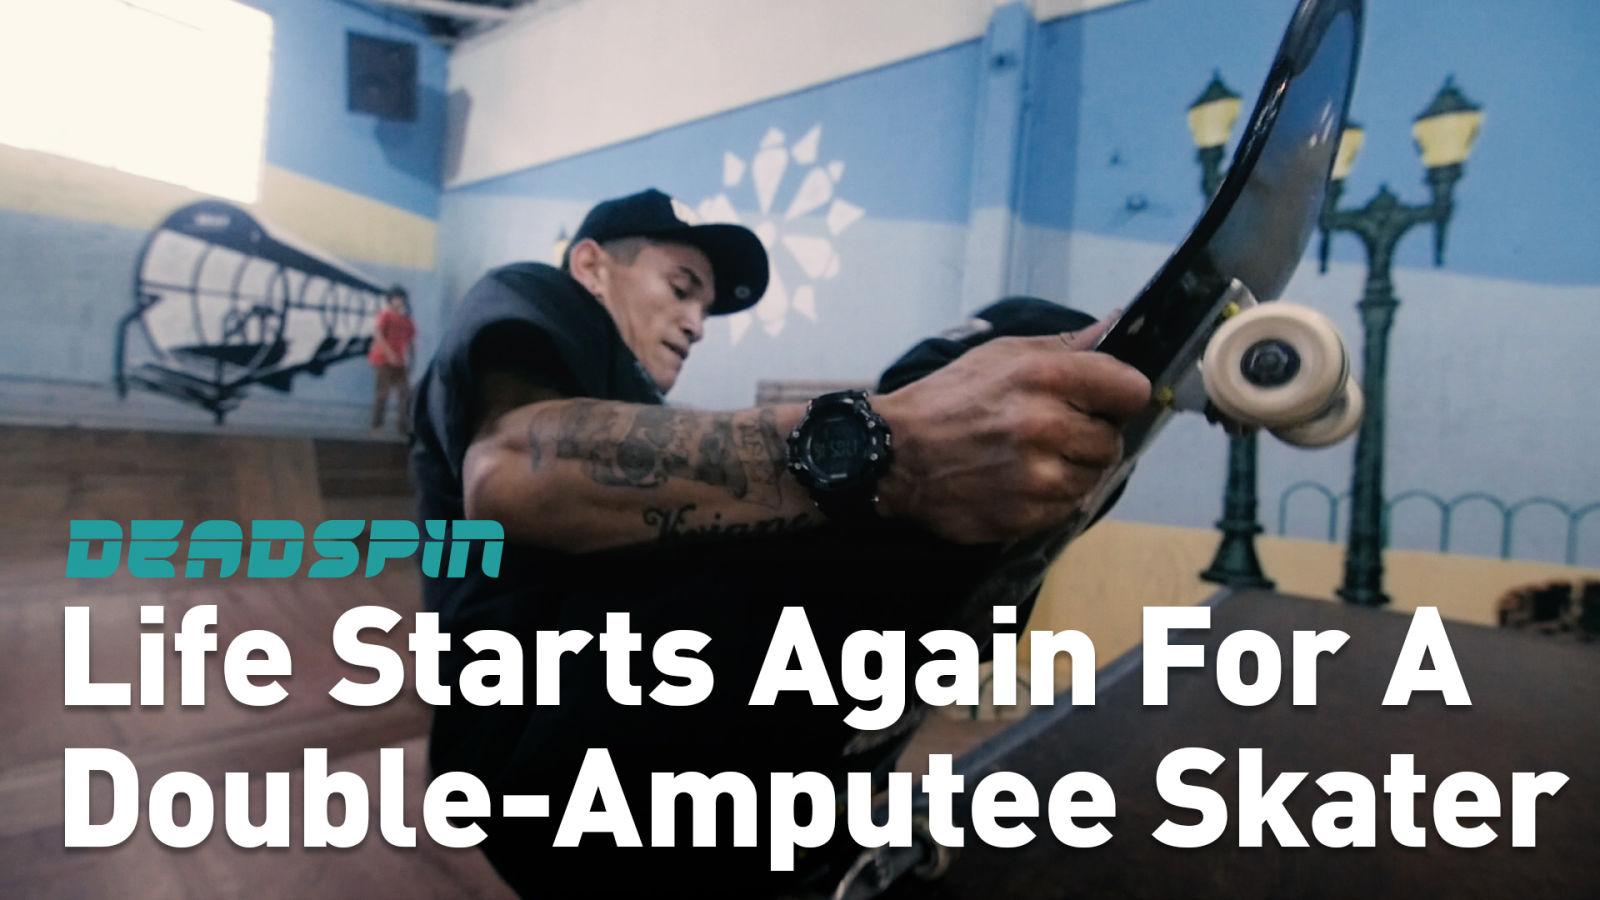 Skateboarding Gave Double-Amputee Felipe Nunes His Life Back